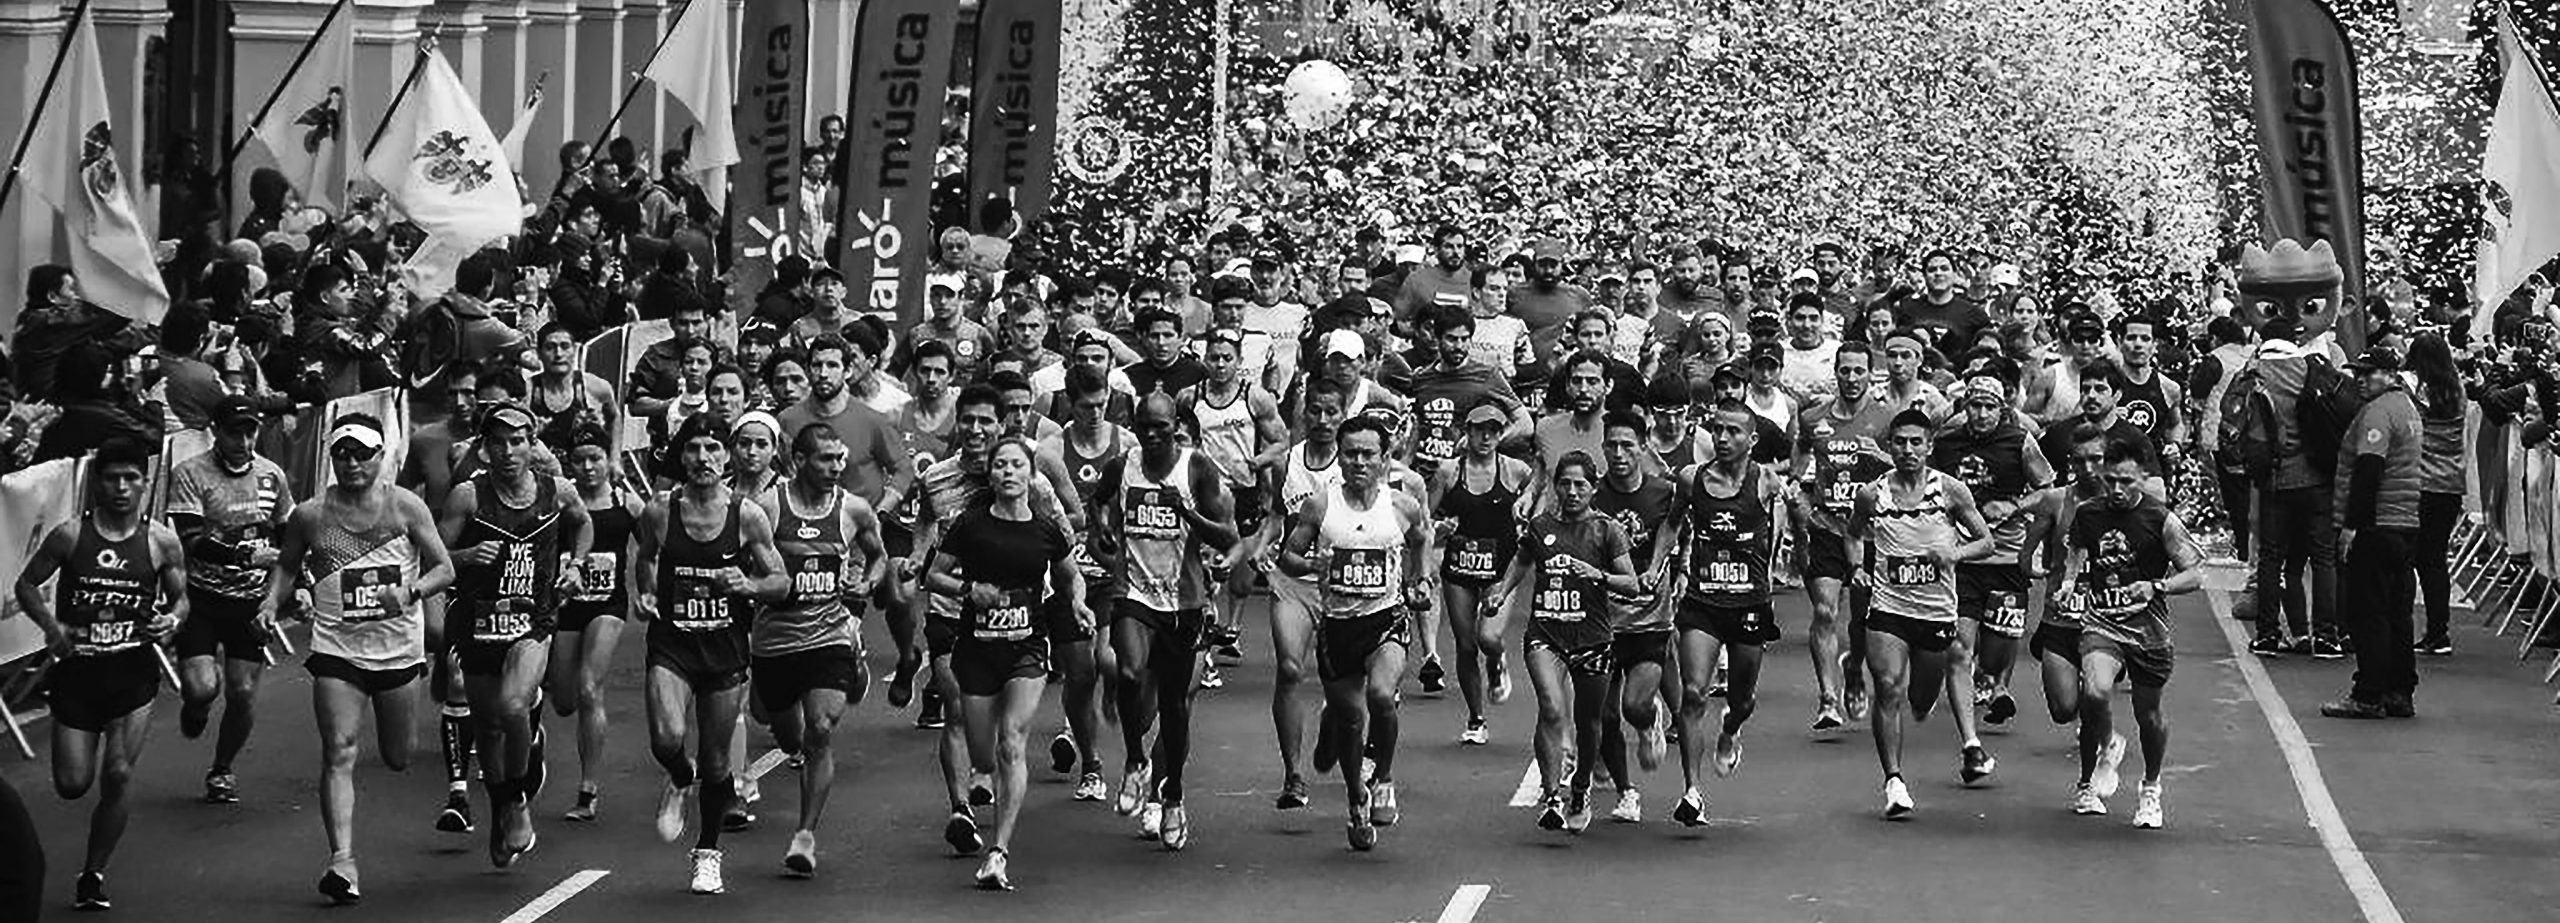 110 Media Maratón de Lima & 10K 2019